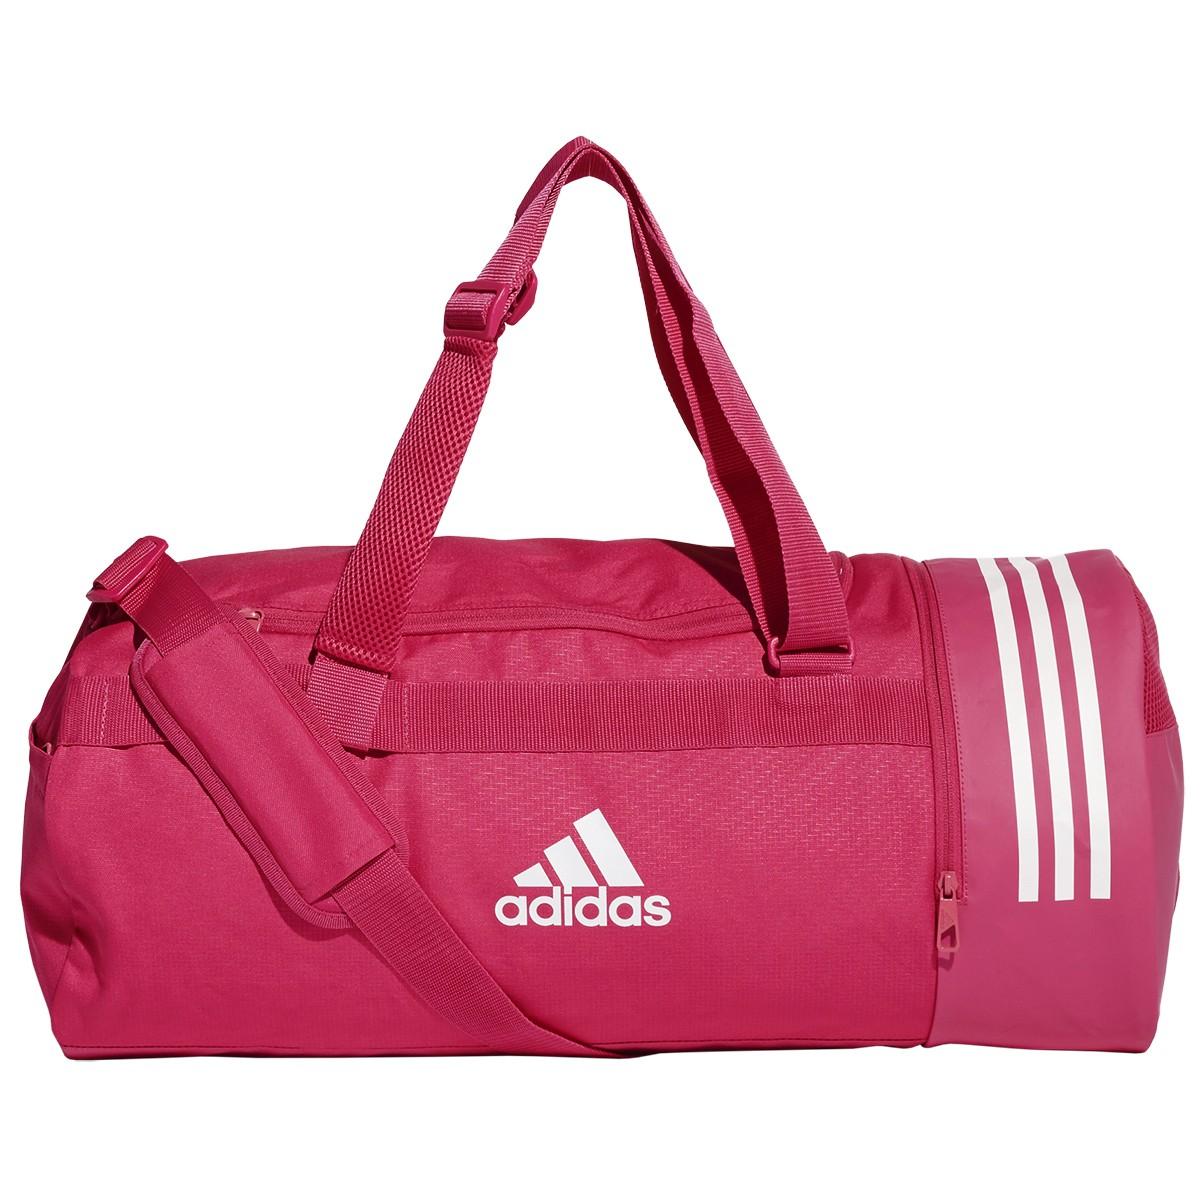 Adidas Deporte De Athlete Bolsa Classic BolsasTennispro 1cTJFulK3